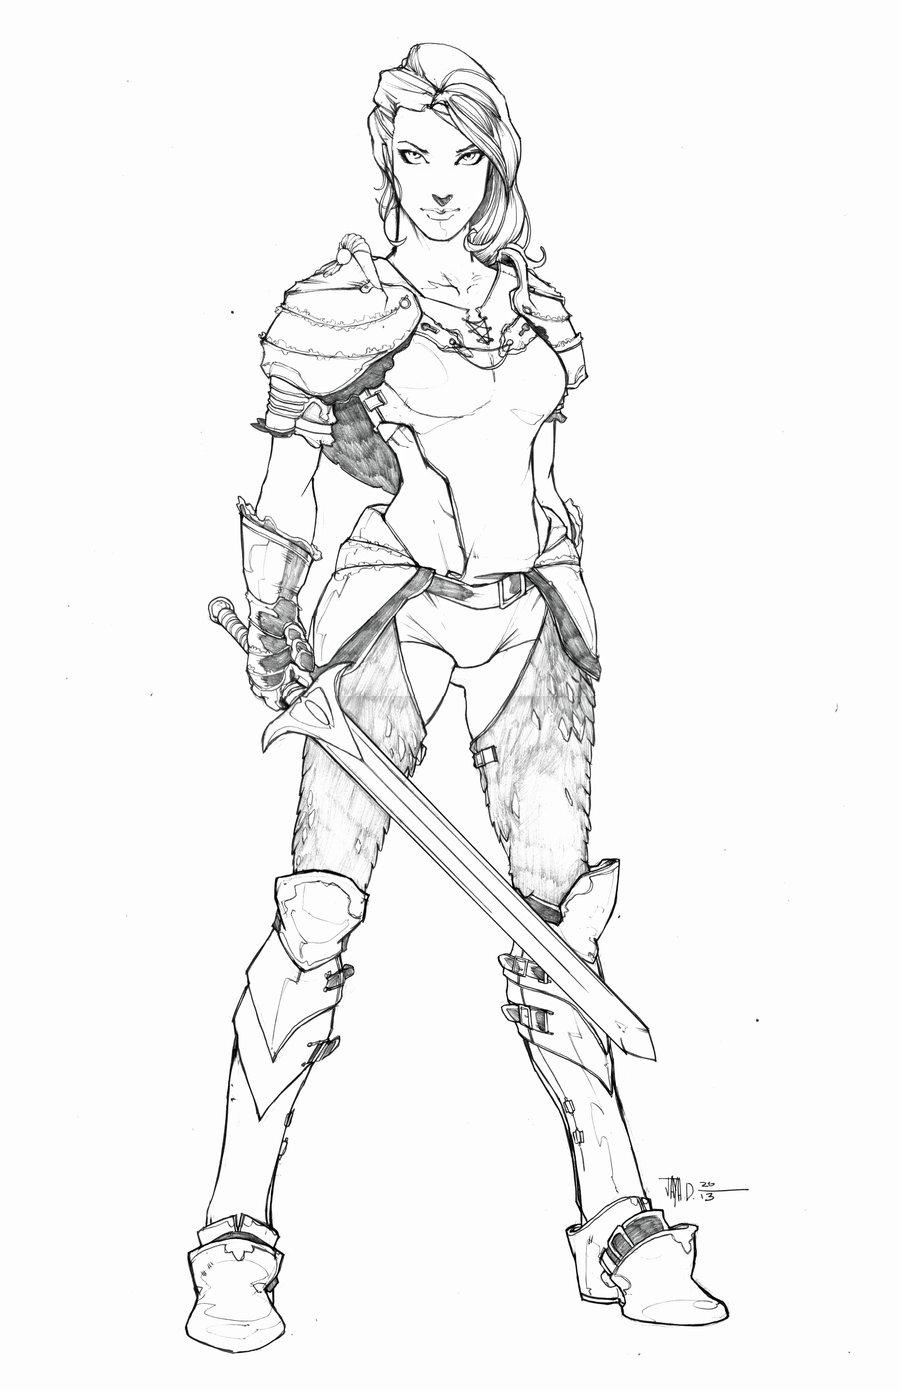 Drawn warrior Warrior Warrior Realistic Image Girl